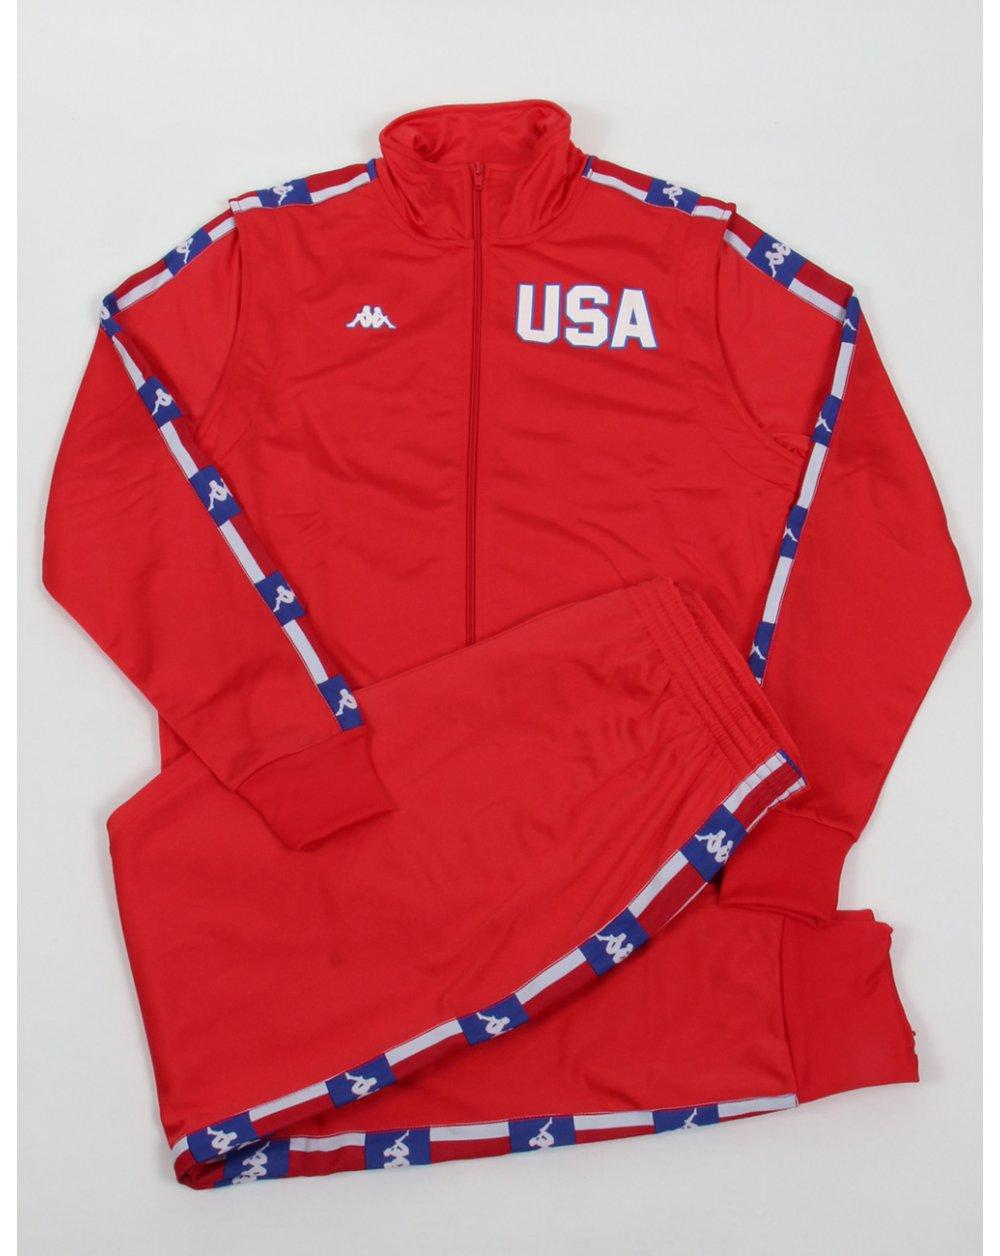 e93c08b396 Robe Di Kappa La84 Usa Olympic Full Tracksuit Red